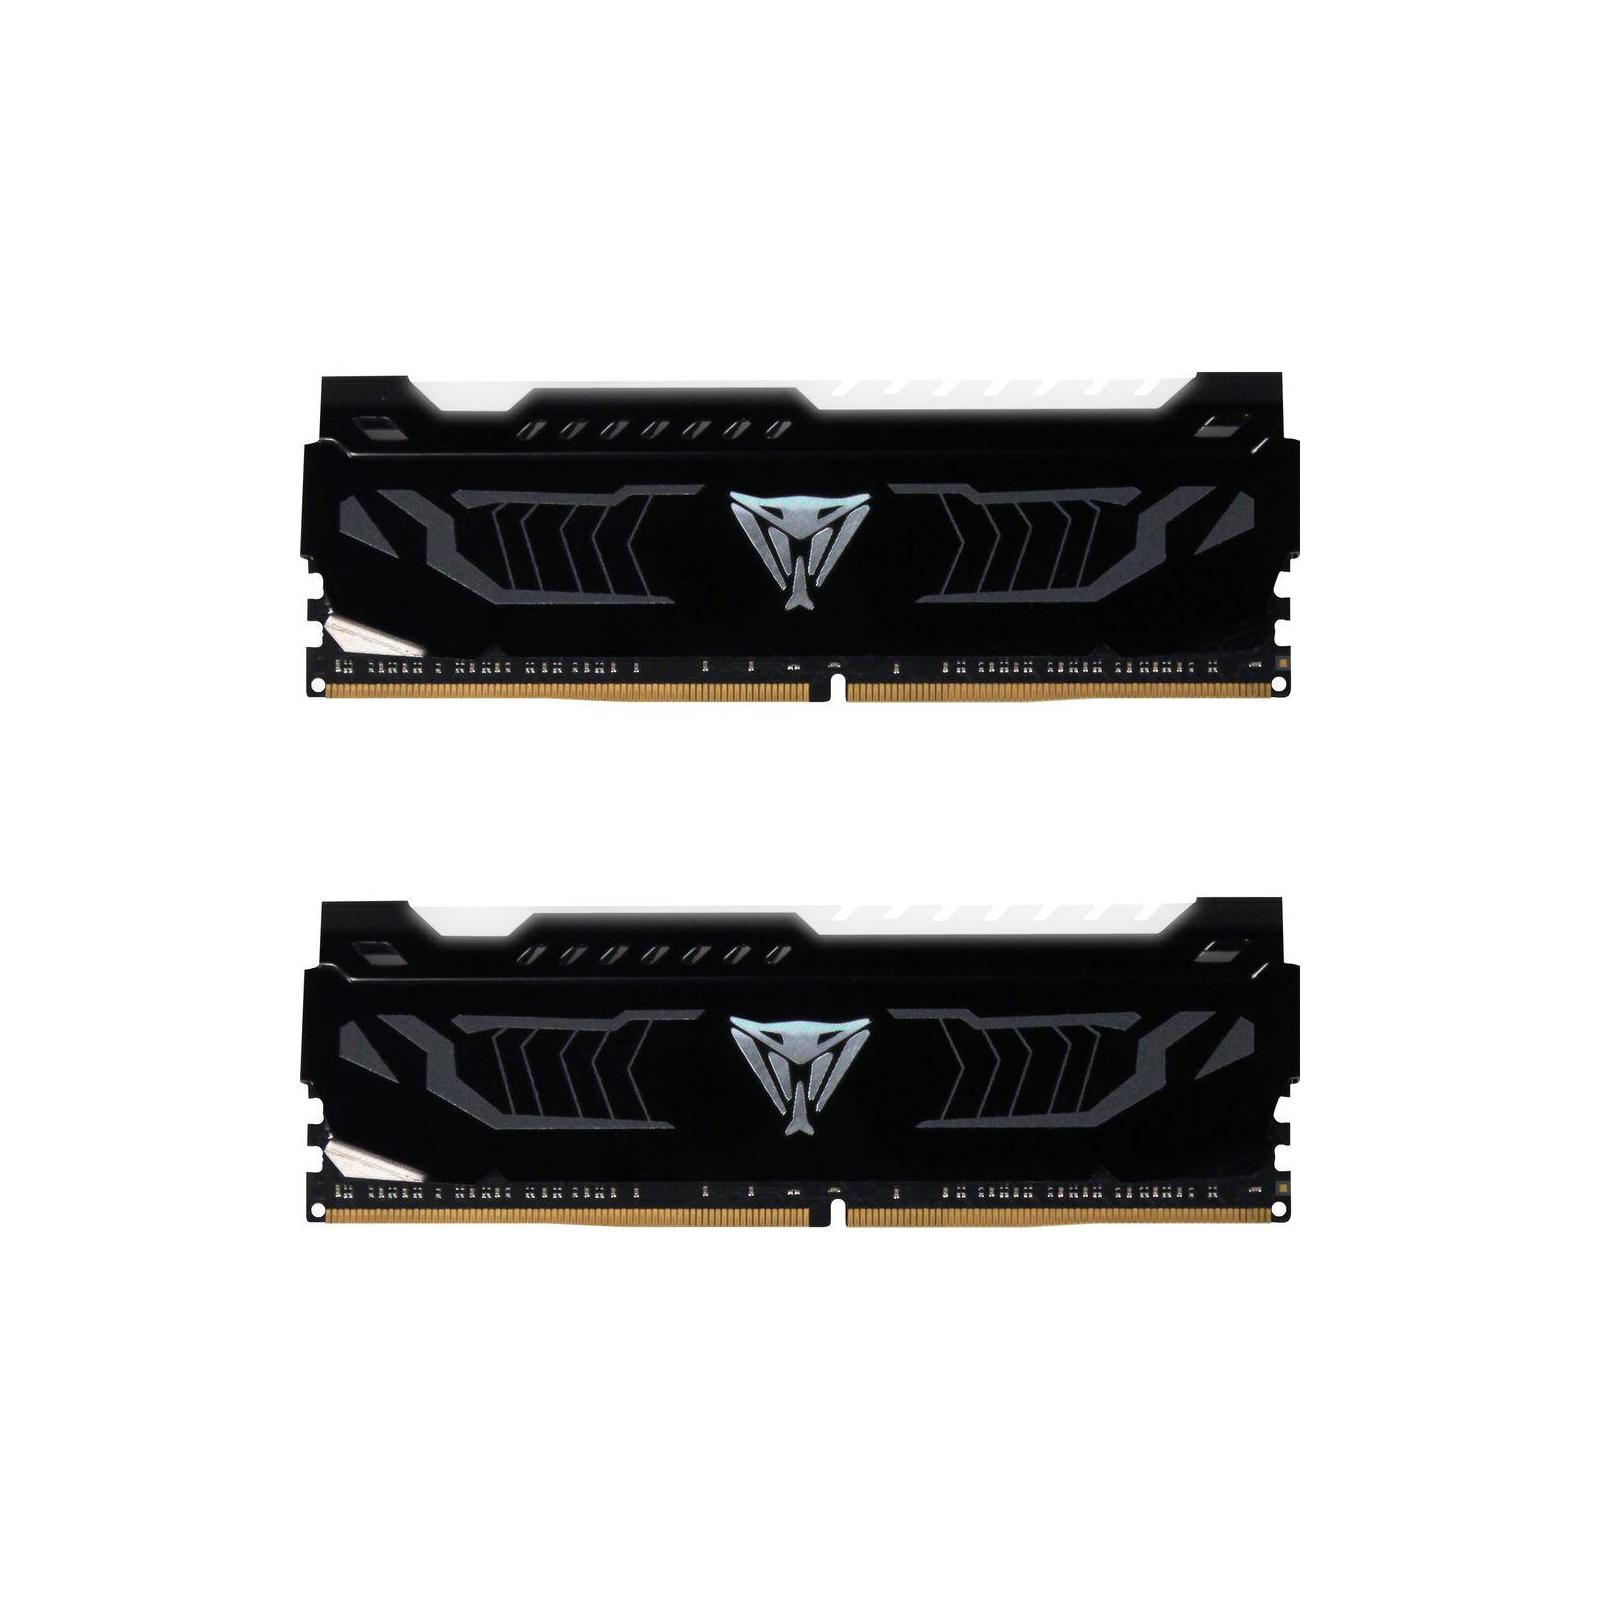 Модуль памяти для компьютера DDR4 16GB (2x8GB) 3600 MHz Patriot (PVLW416G360C6K)